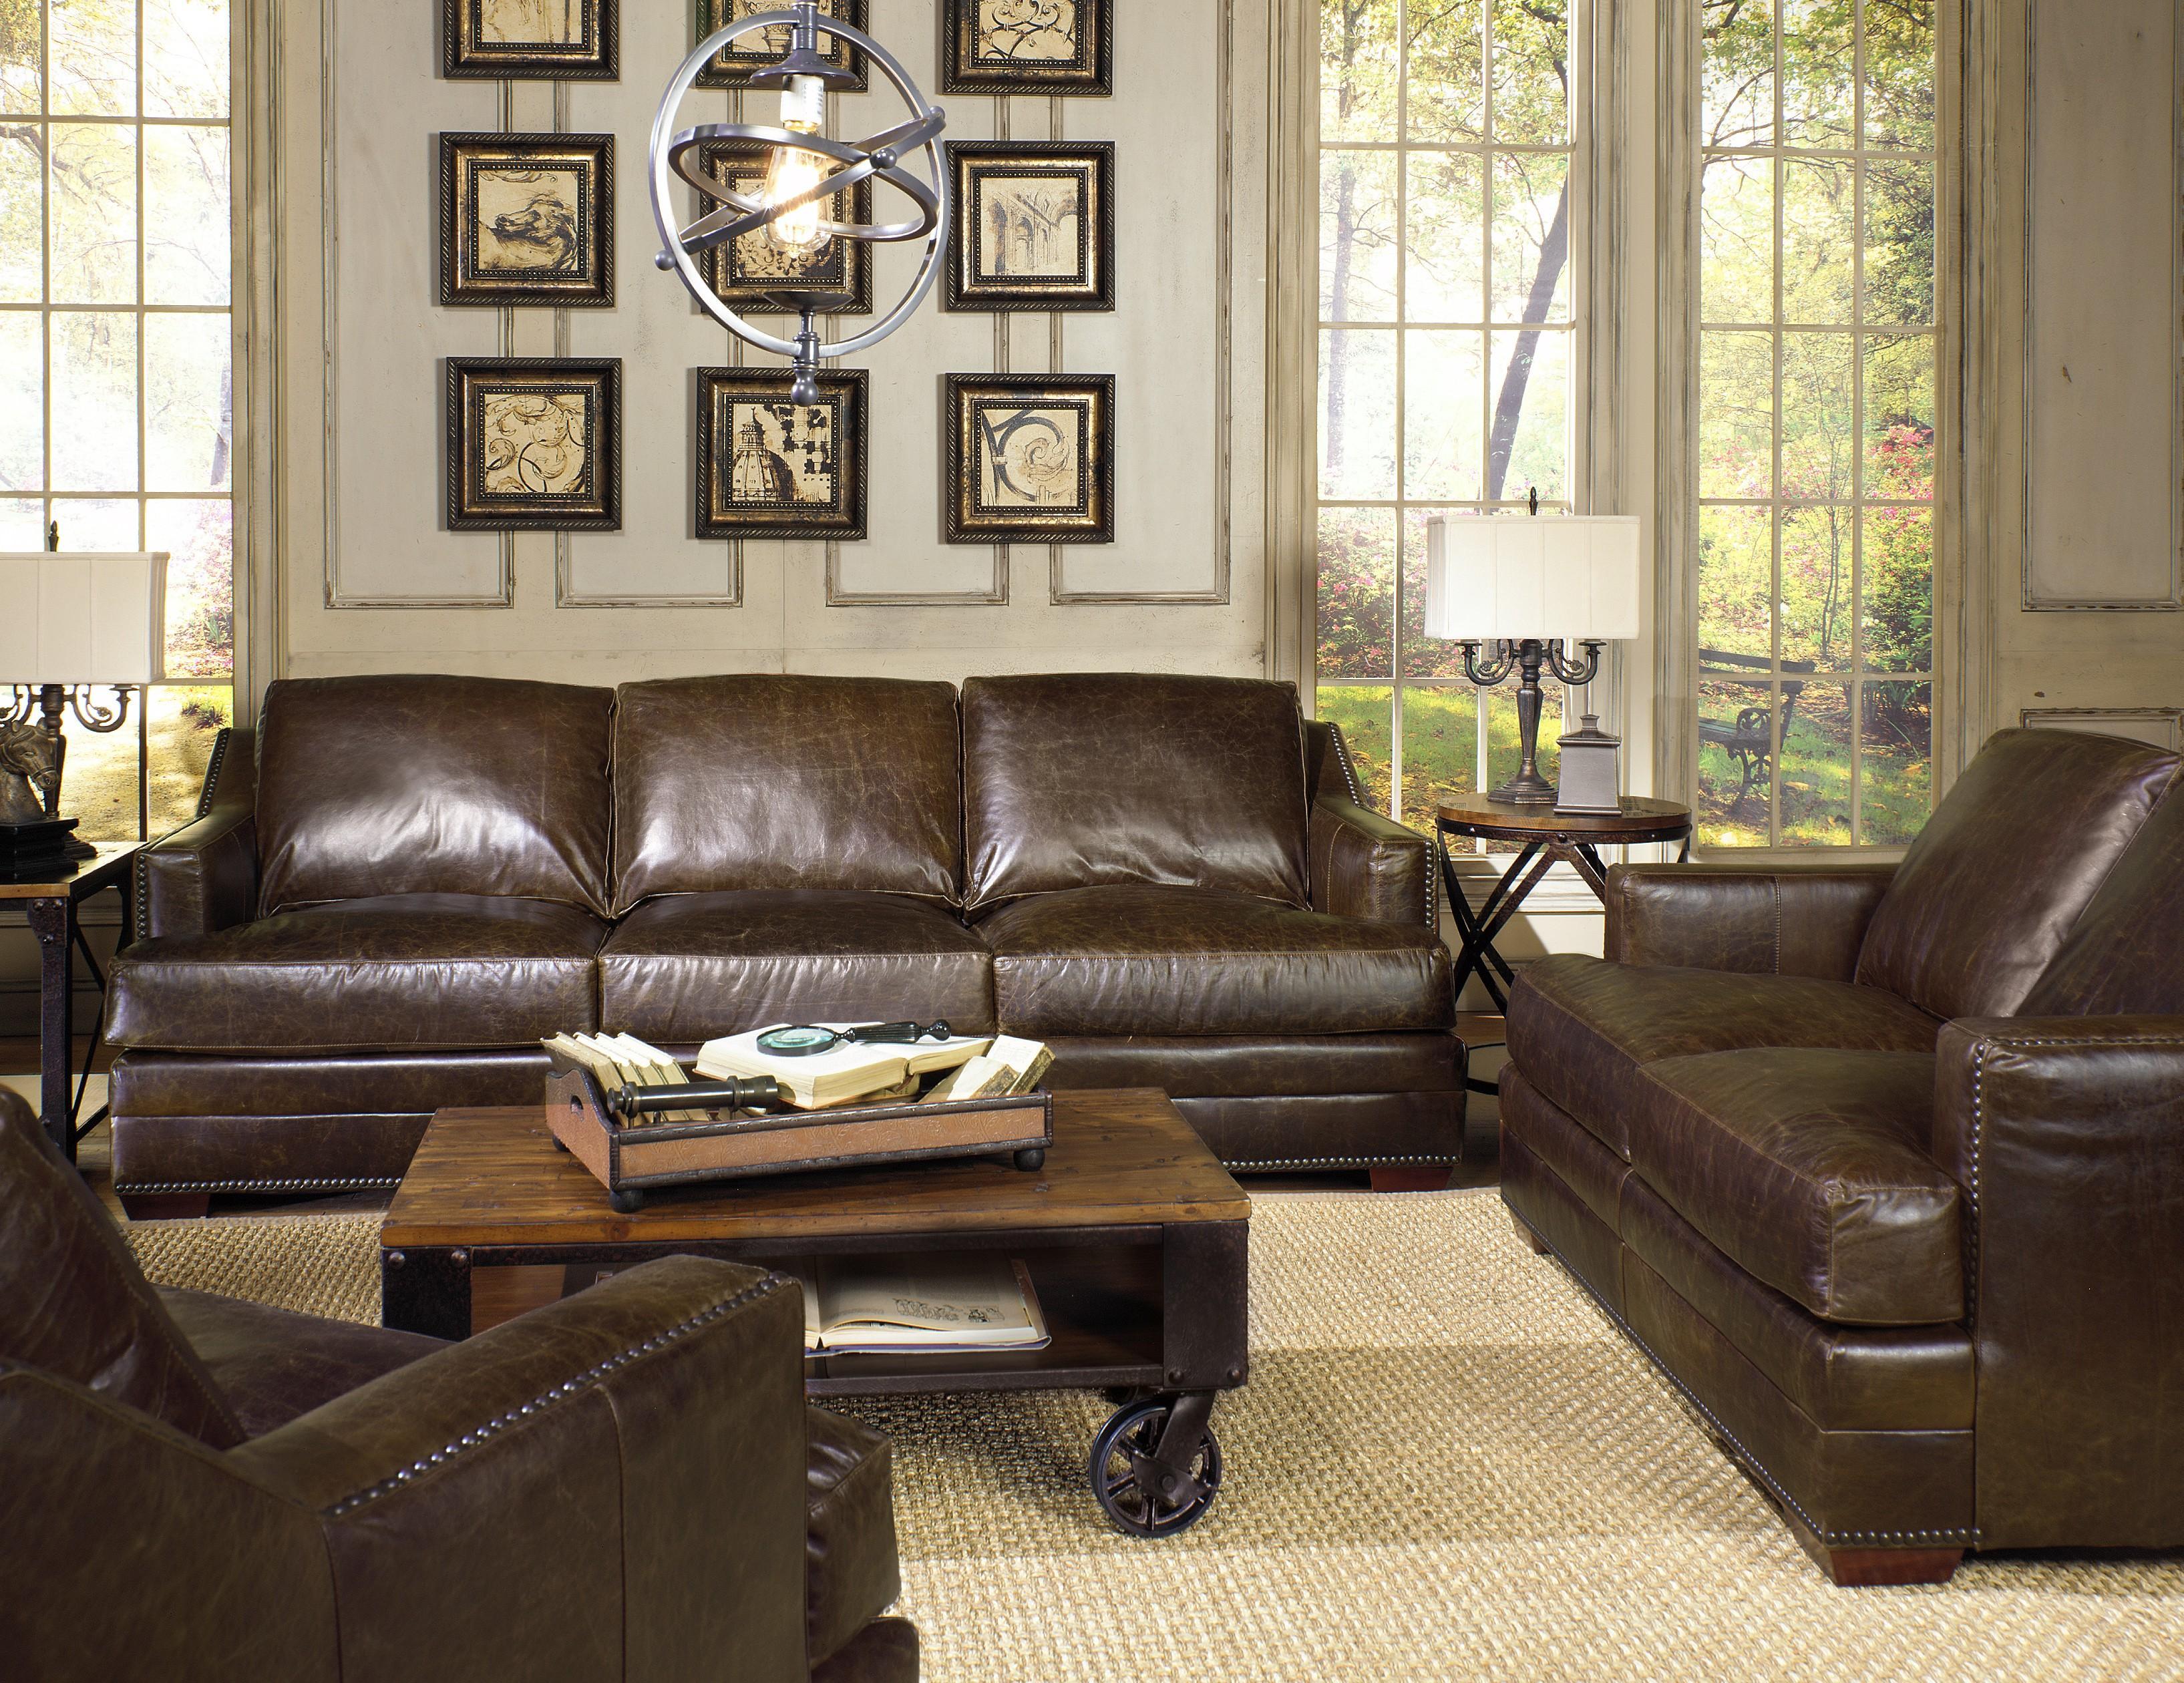 USA Premium Leather 9355 Rocker Recliner W/ Track Arms   Dream Home  Furniture   Three Way Recliner Roswell, Kennesaw, Alpharetta, Marietta,  Atlanta, Georgia